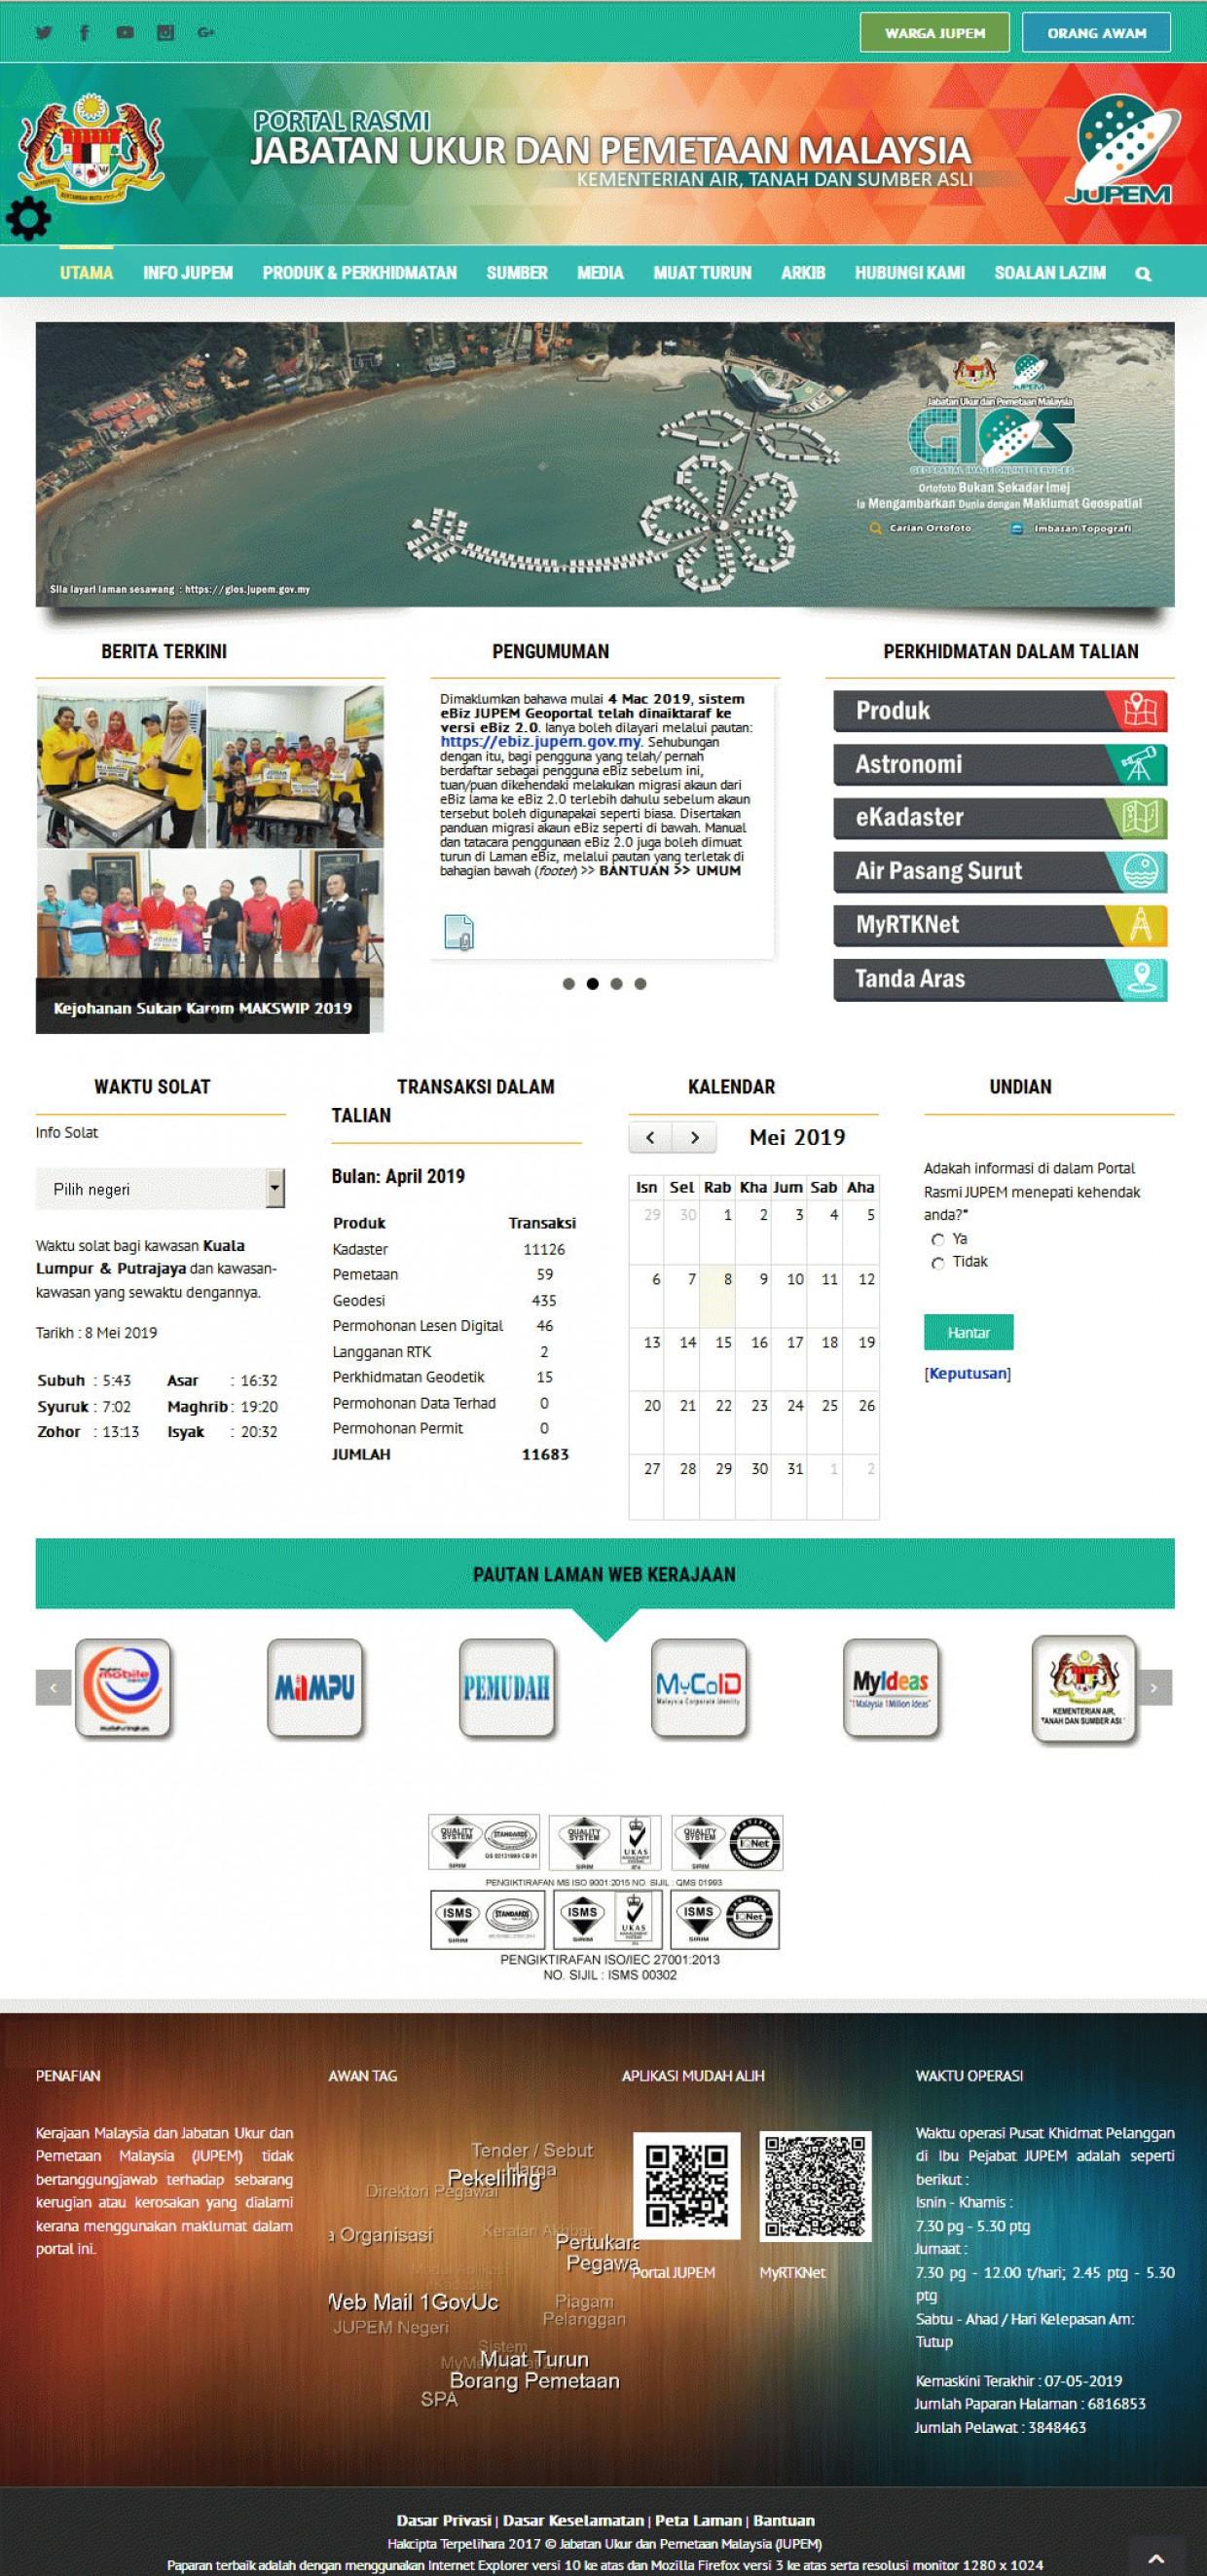 Screenshot Jabatan Ukur Dan Pemetaan Malaysia (JUPEM)